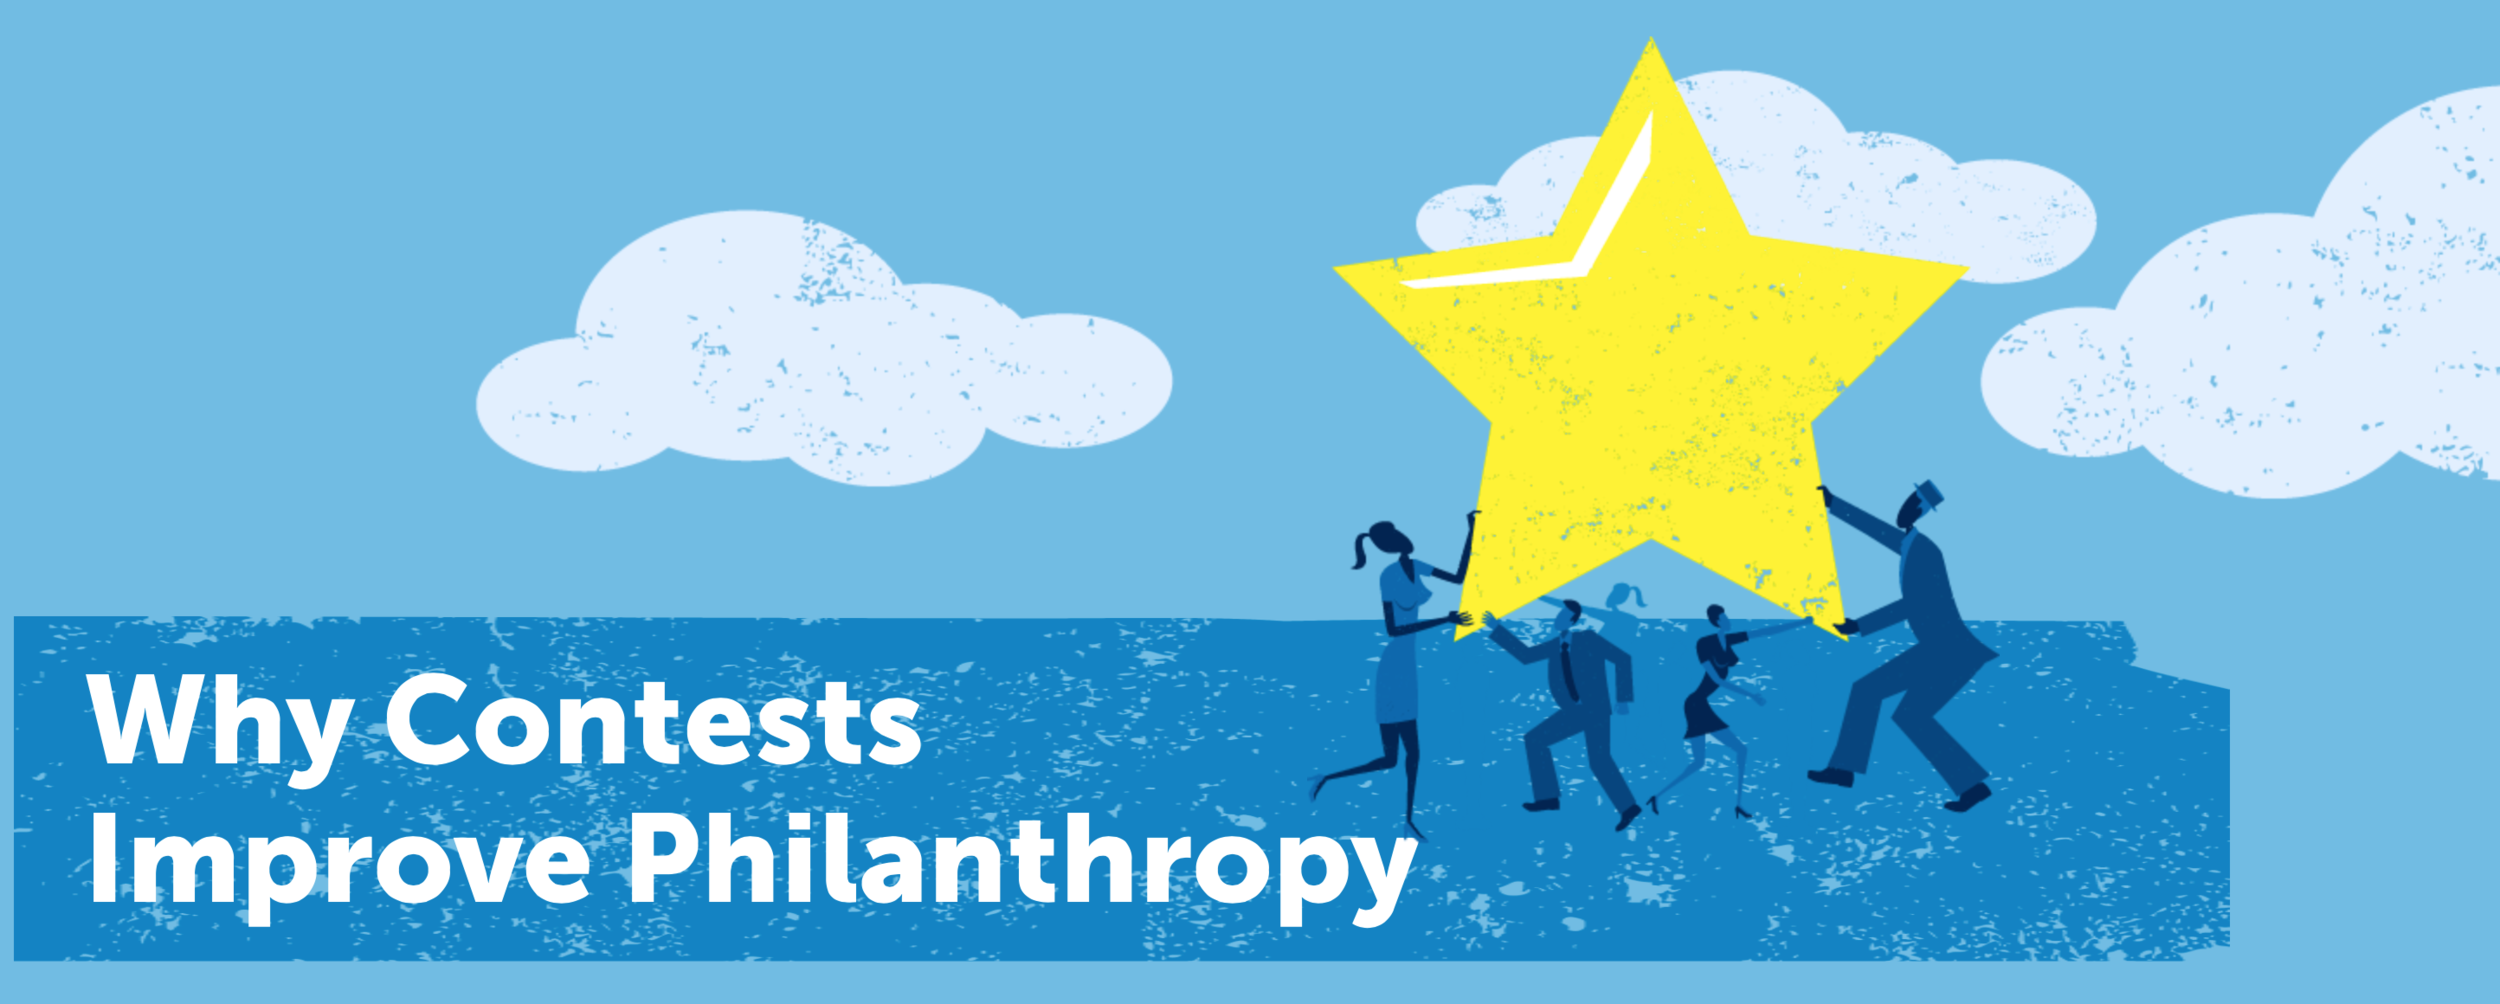 2013-0822-Knight Foundation Philanthropy.png